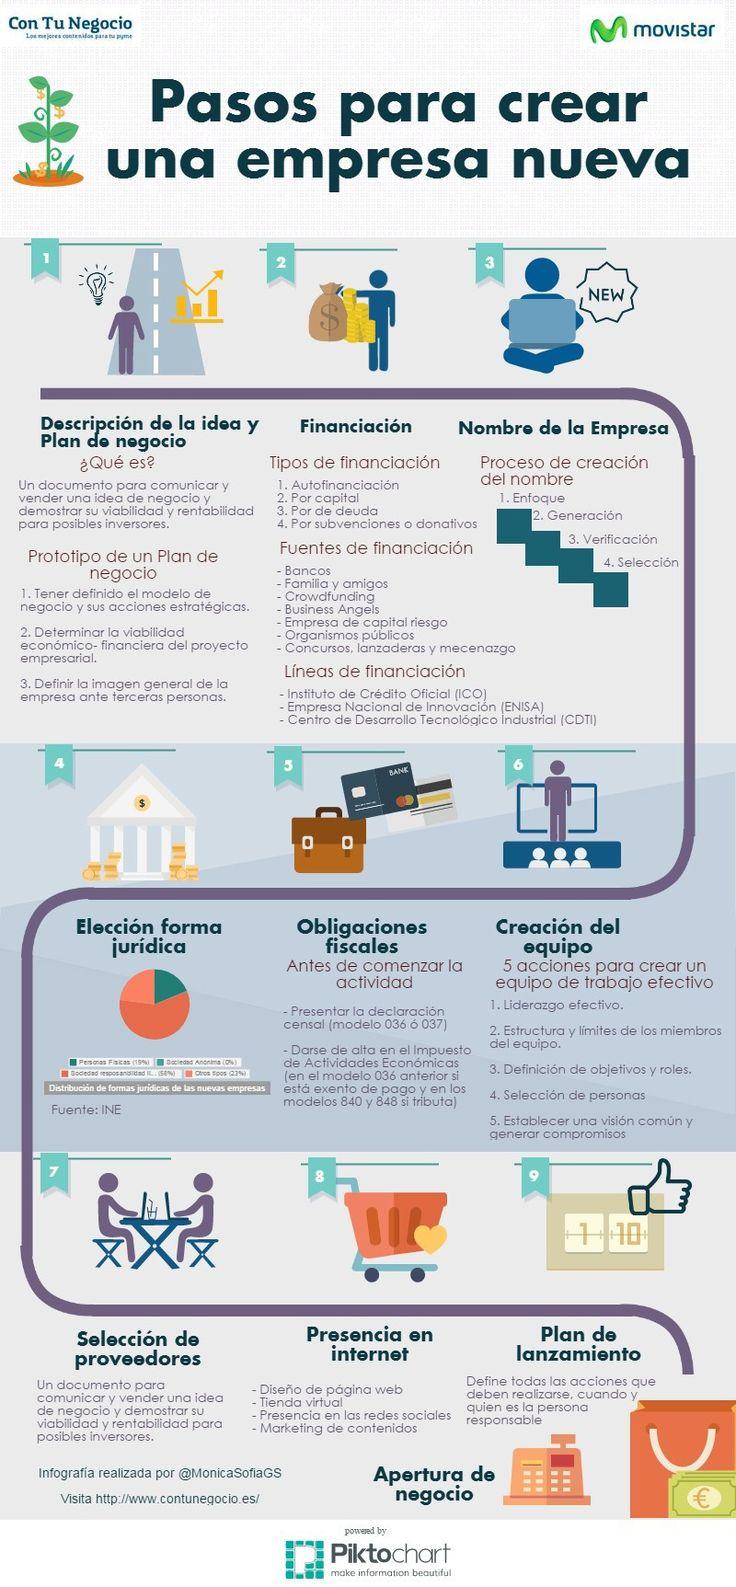 Pasos para crear una empresa nueva #infografia #infographic #entrepreneurship